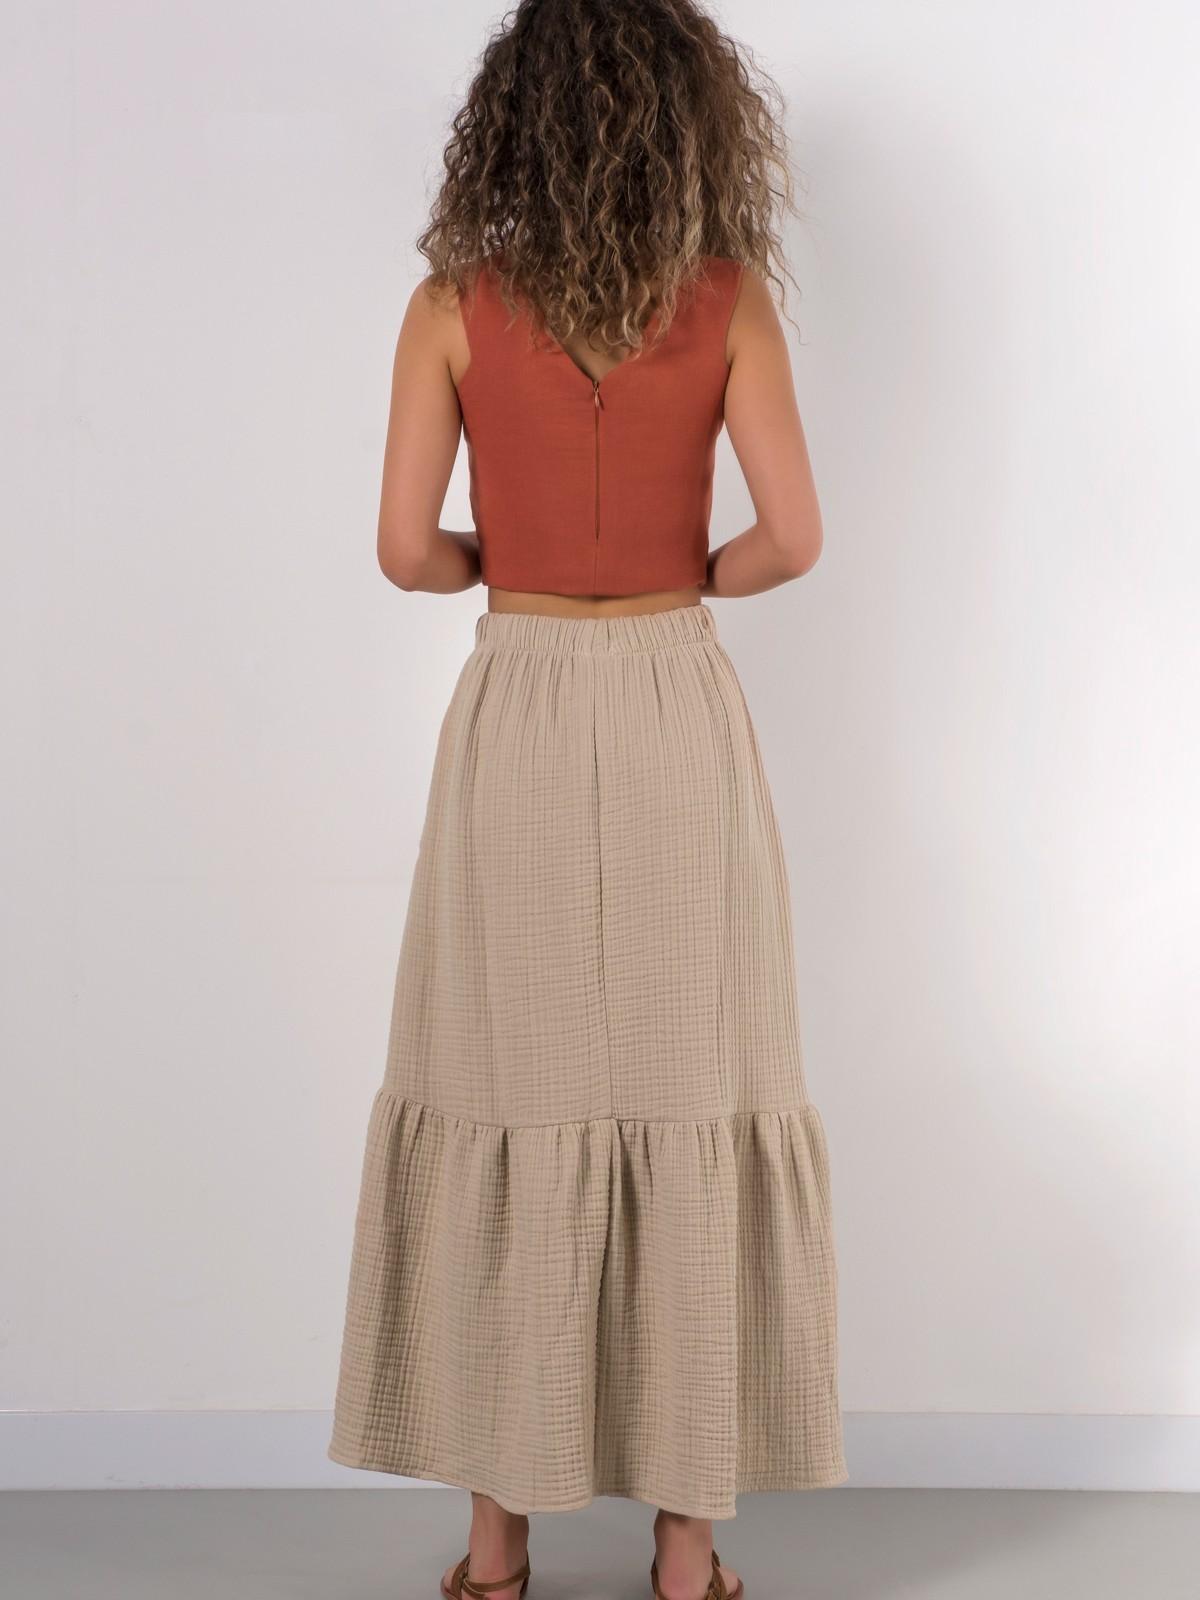 alba-skirt-beige-1200x1600w